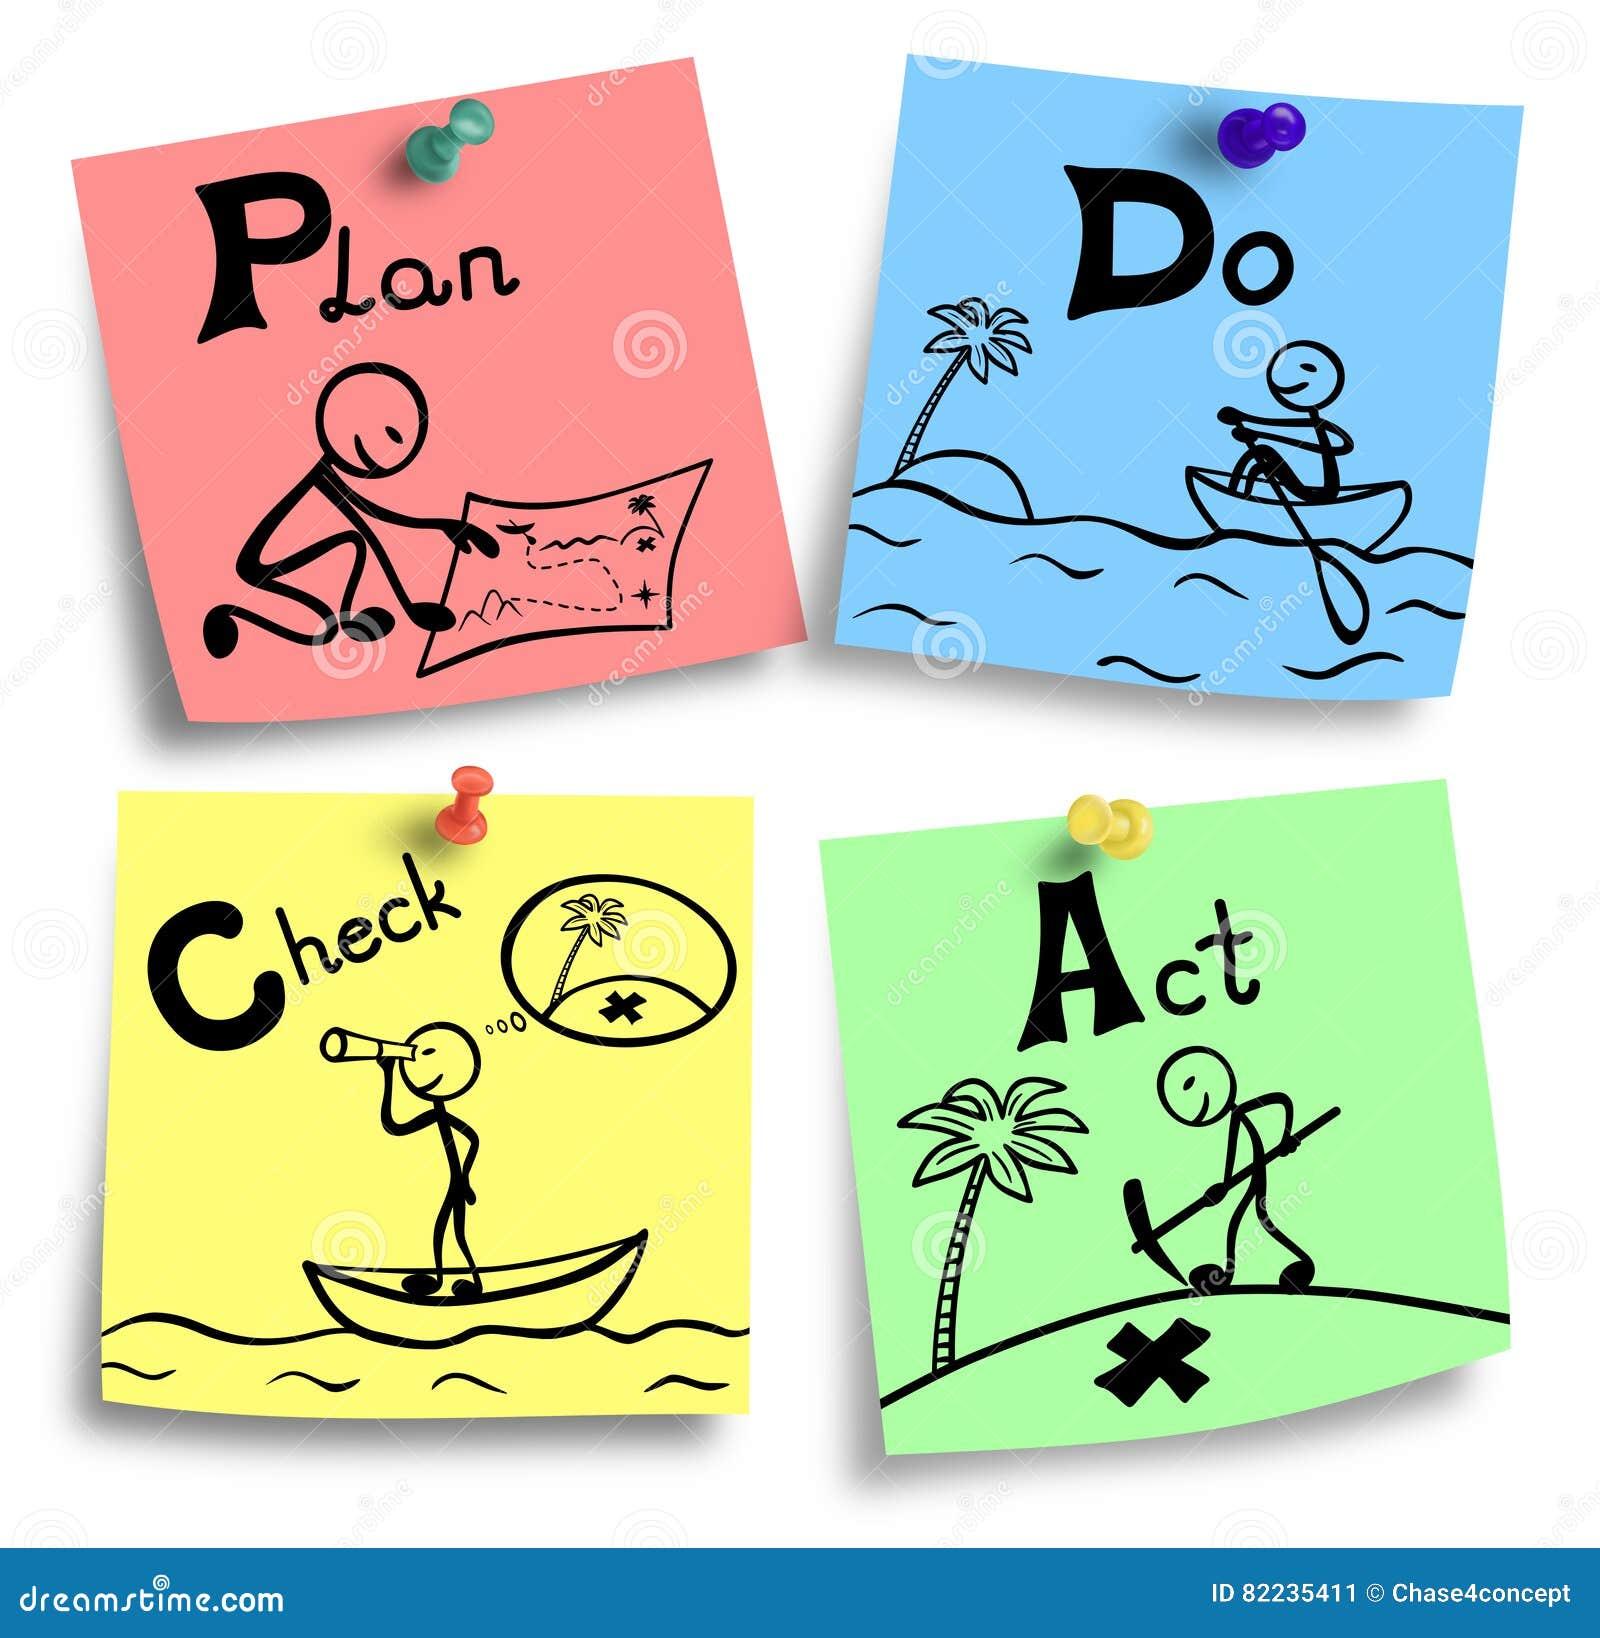 Illustration Pdca Principle Colorful Notes Plan Do Check Act Concept Four Steps